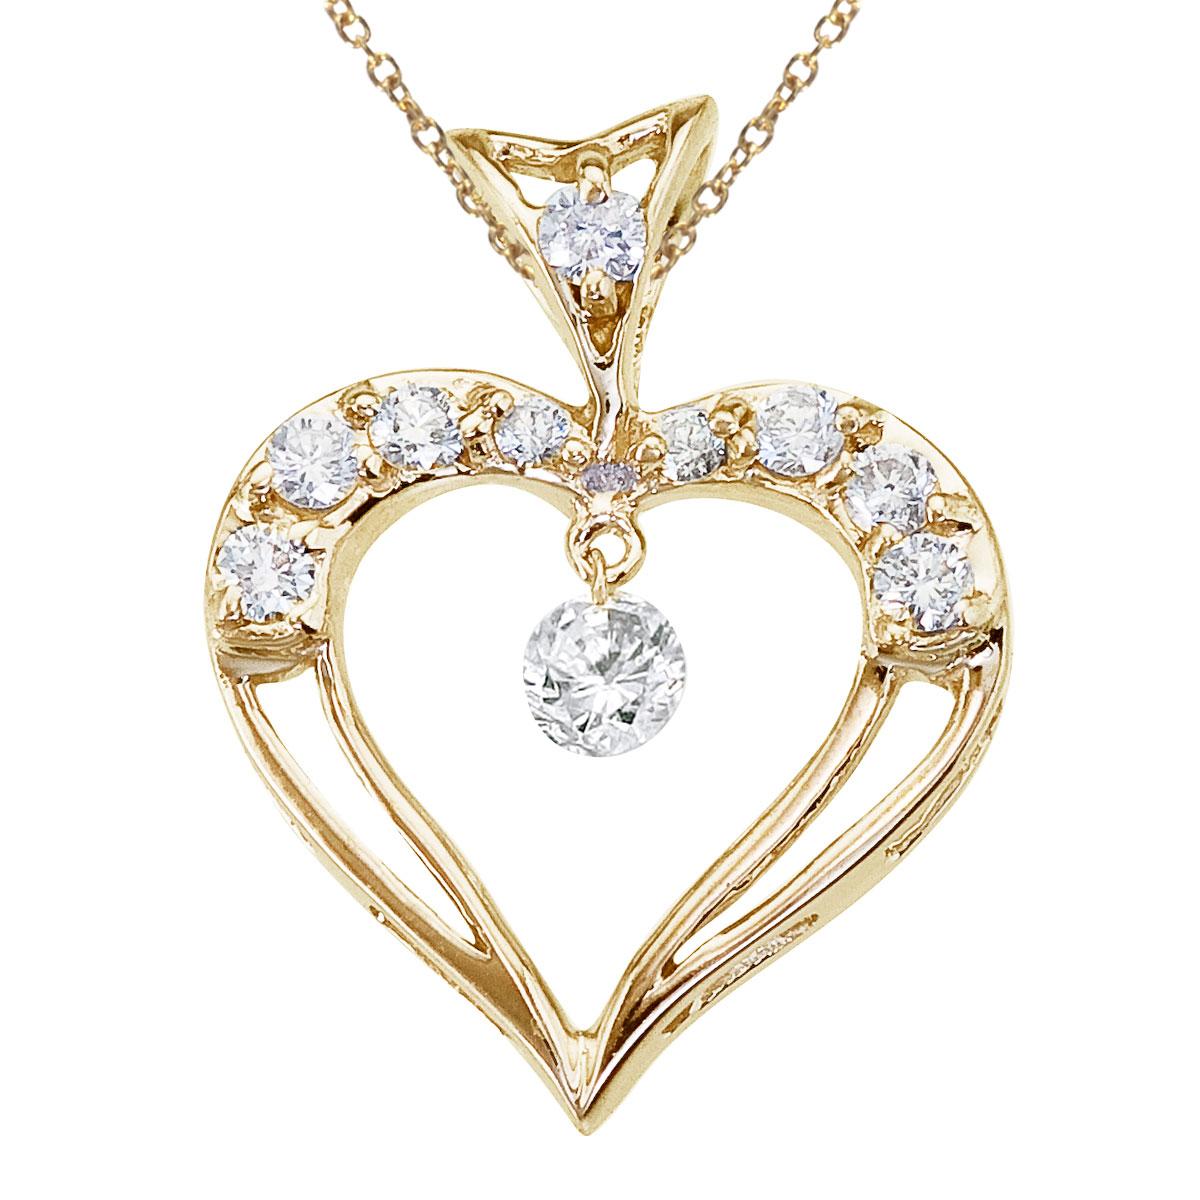 JCX2947: 14K Yellow Gold Dashing Diamond Heart Pendant Watch as the diamonds dangle  glitter and sparkle in the setting!